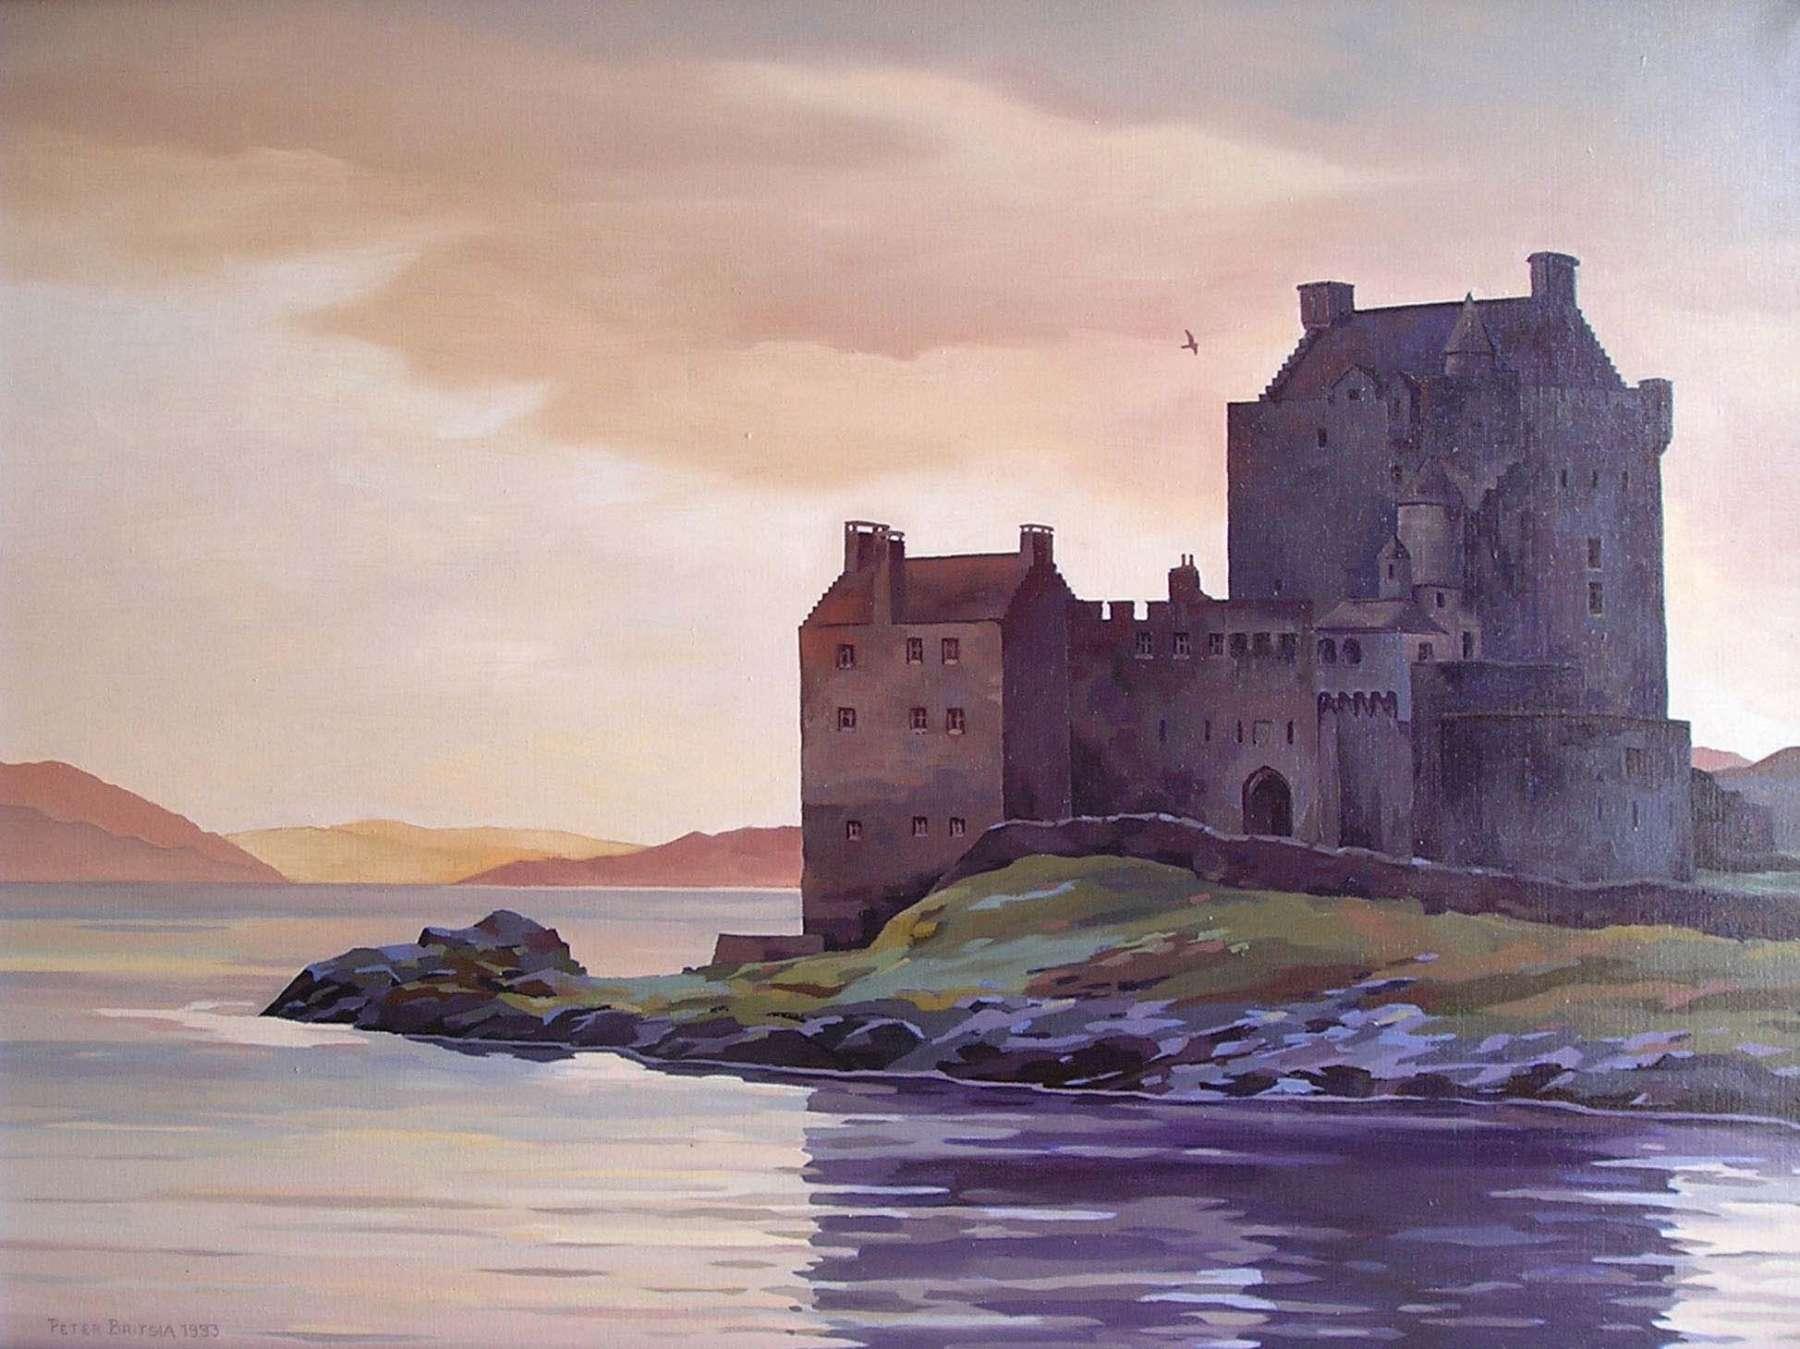 Eilean Donan Castle - Schotland - acrylverf - 80 x 60 cm.